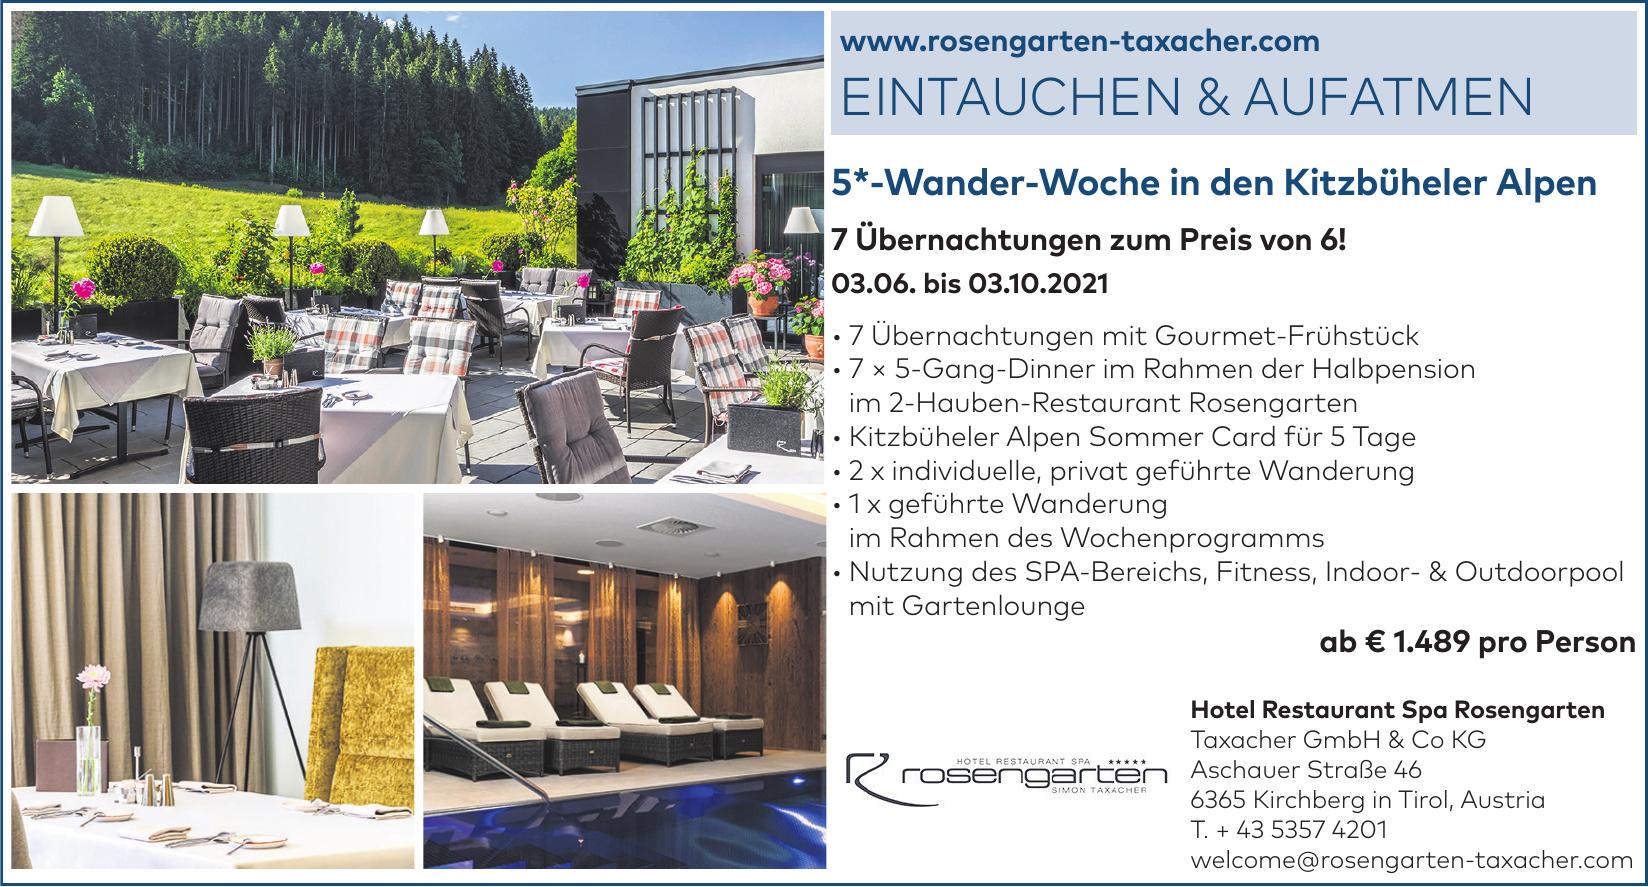 Hotel Restaurant Spa Rosengarten - Taxacher GmbH & Co KG